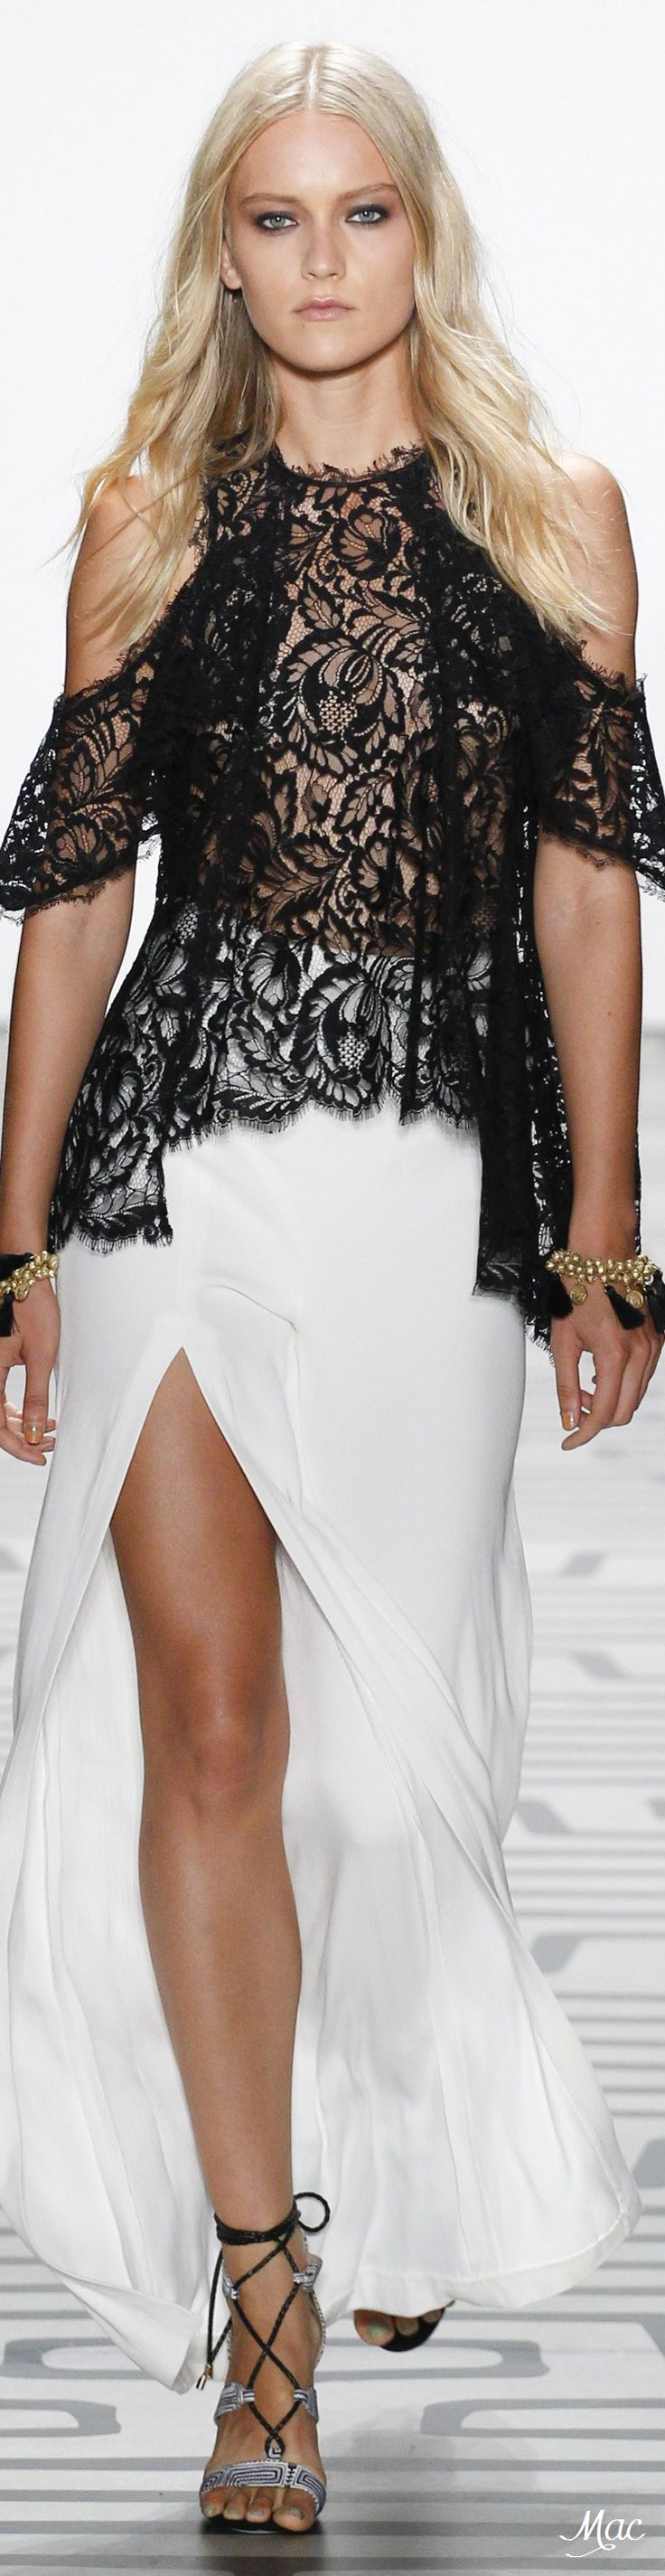 *.* Spring 2017 Ready-to-Wear Nicole Miller - black & white